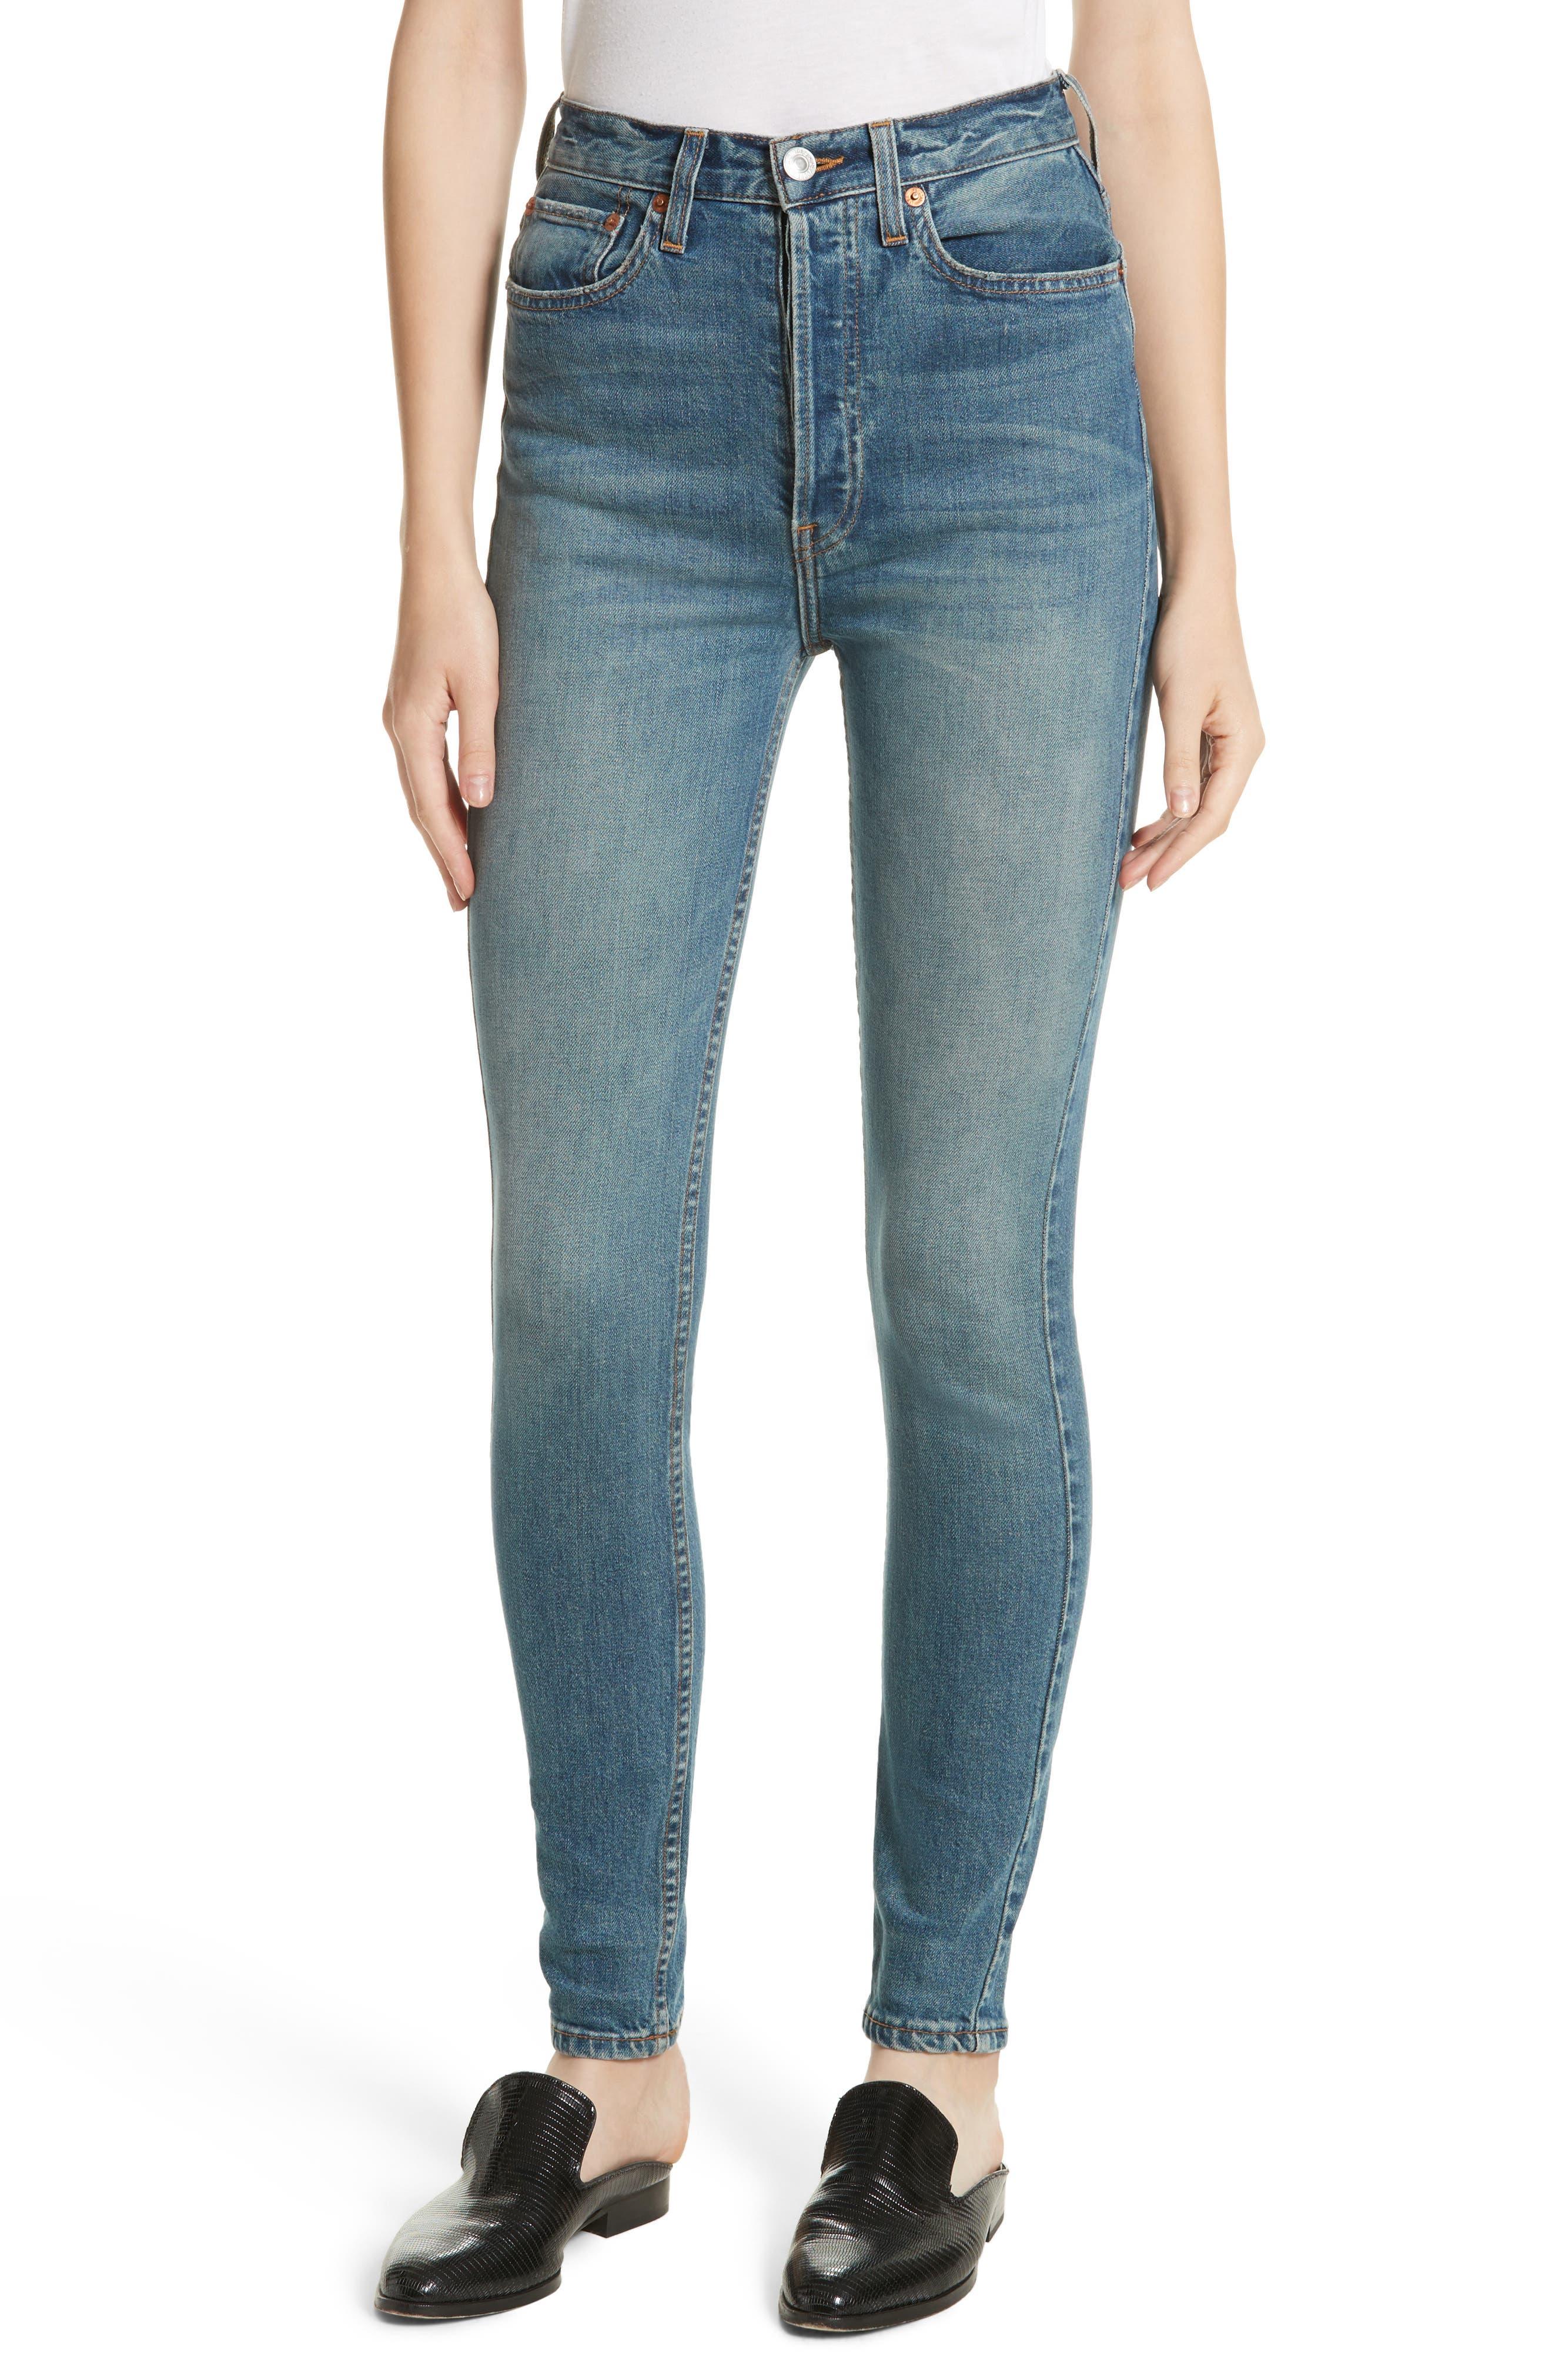 Originals Ultra High Waist Skinny Jeans,                         Main,                         color, Medium Dusty